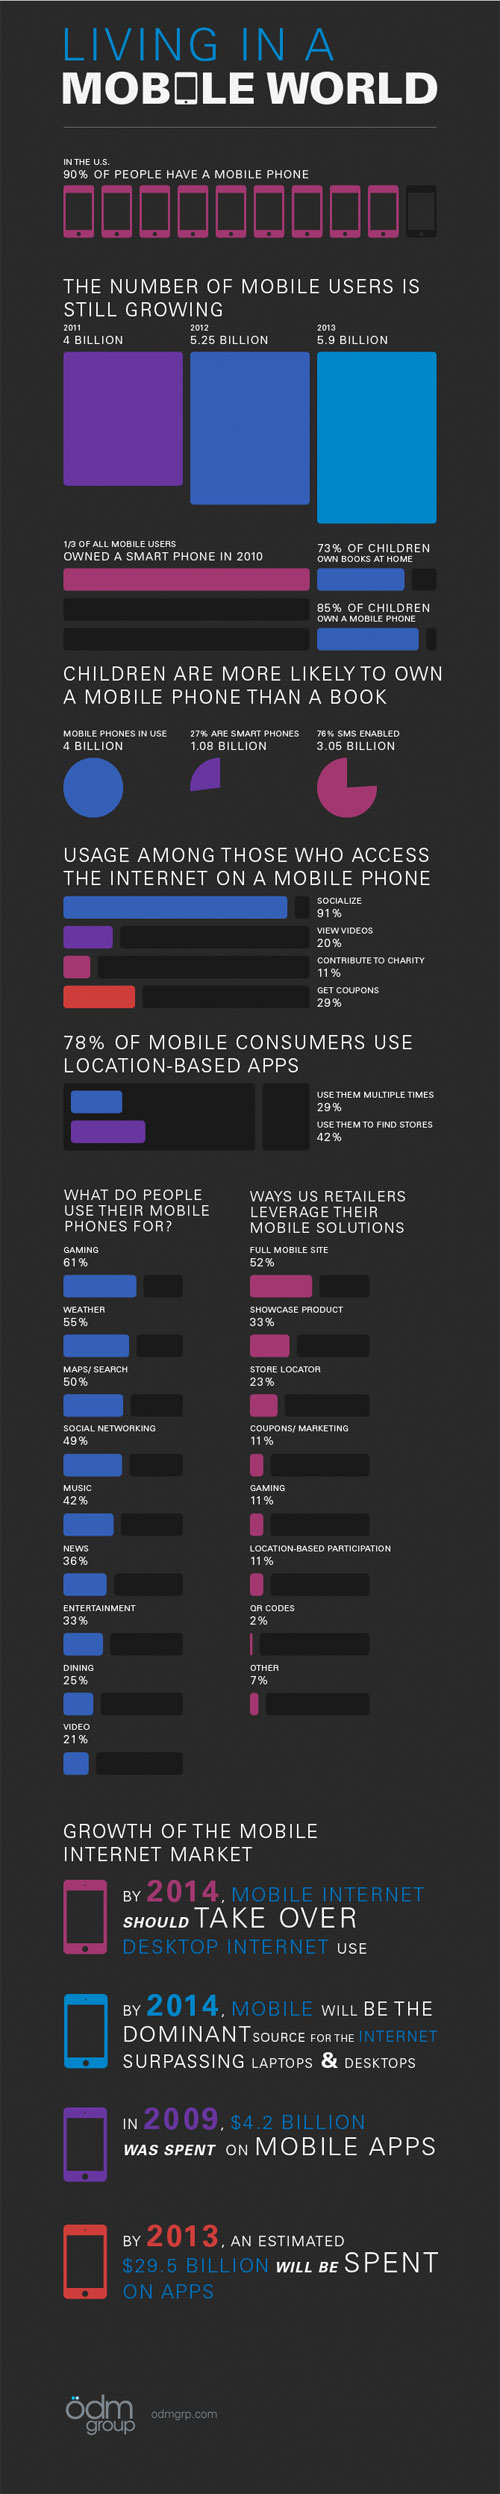 Mobile world, iPhone, Smartphones, News, Info, Mac